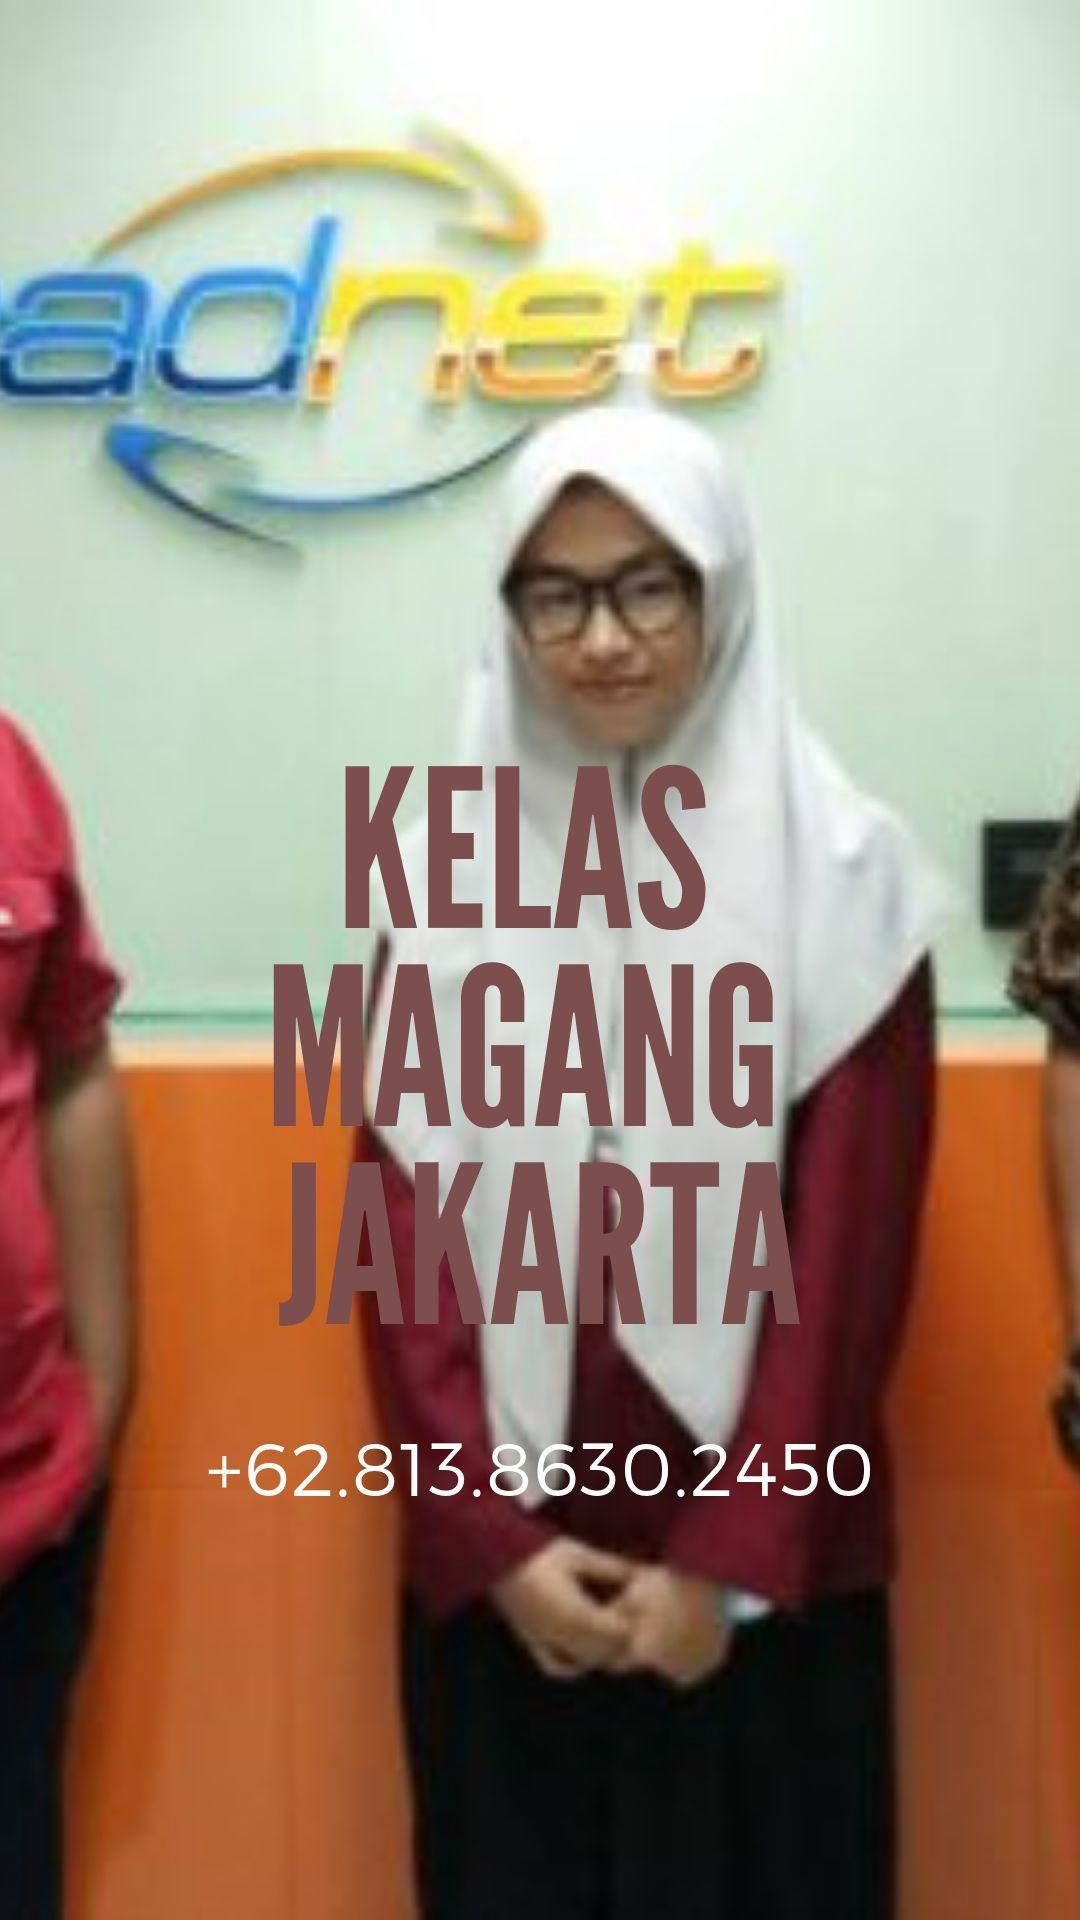 Wa 62 813 8630 2450 Tempat Untuk Mangang Anak Smk Sekitar Jakarta Timur Wa 62 813 8630 2450 Tempat Untuk Mangang Anak Smk Sekitar Jakarta Timur Anak Belajar Marketing